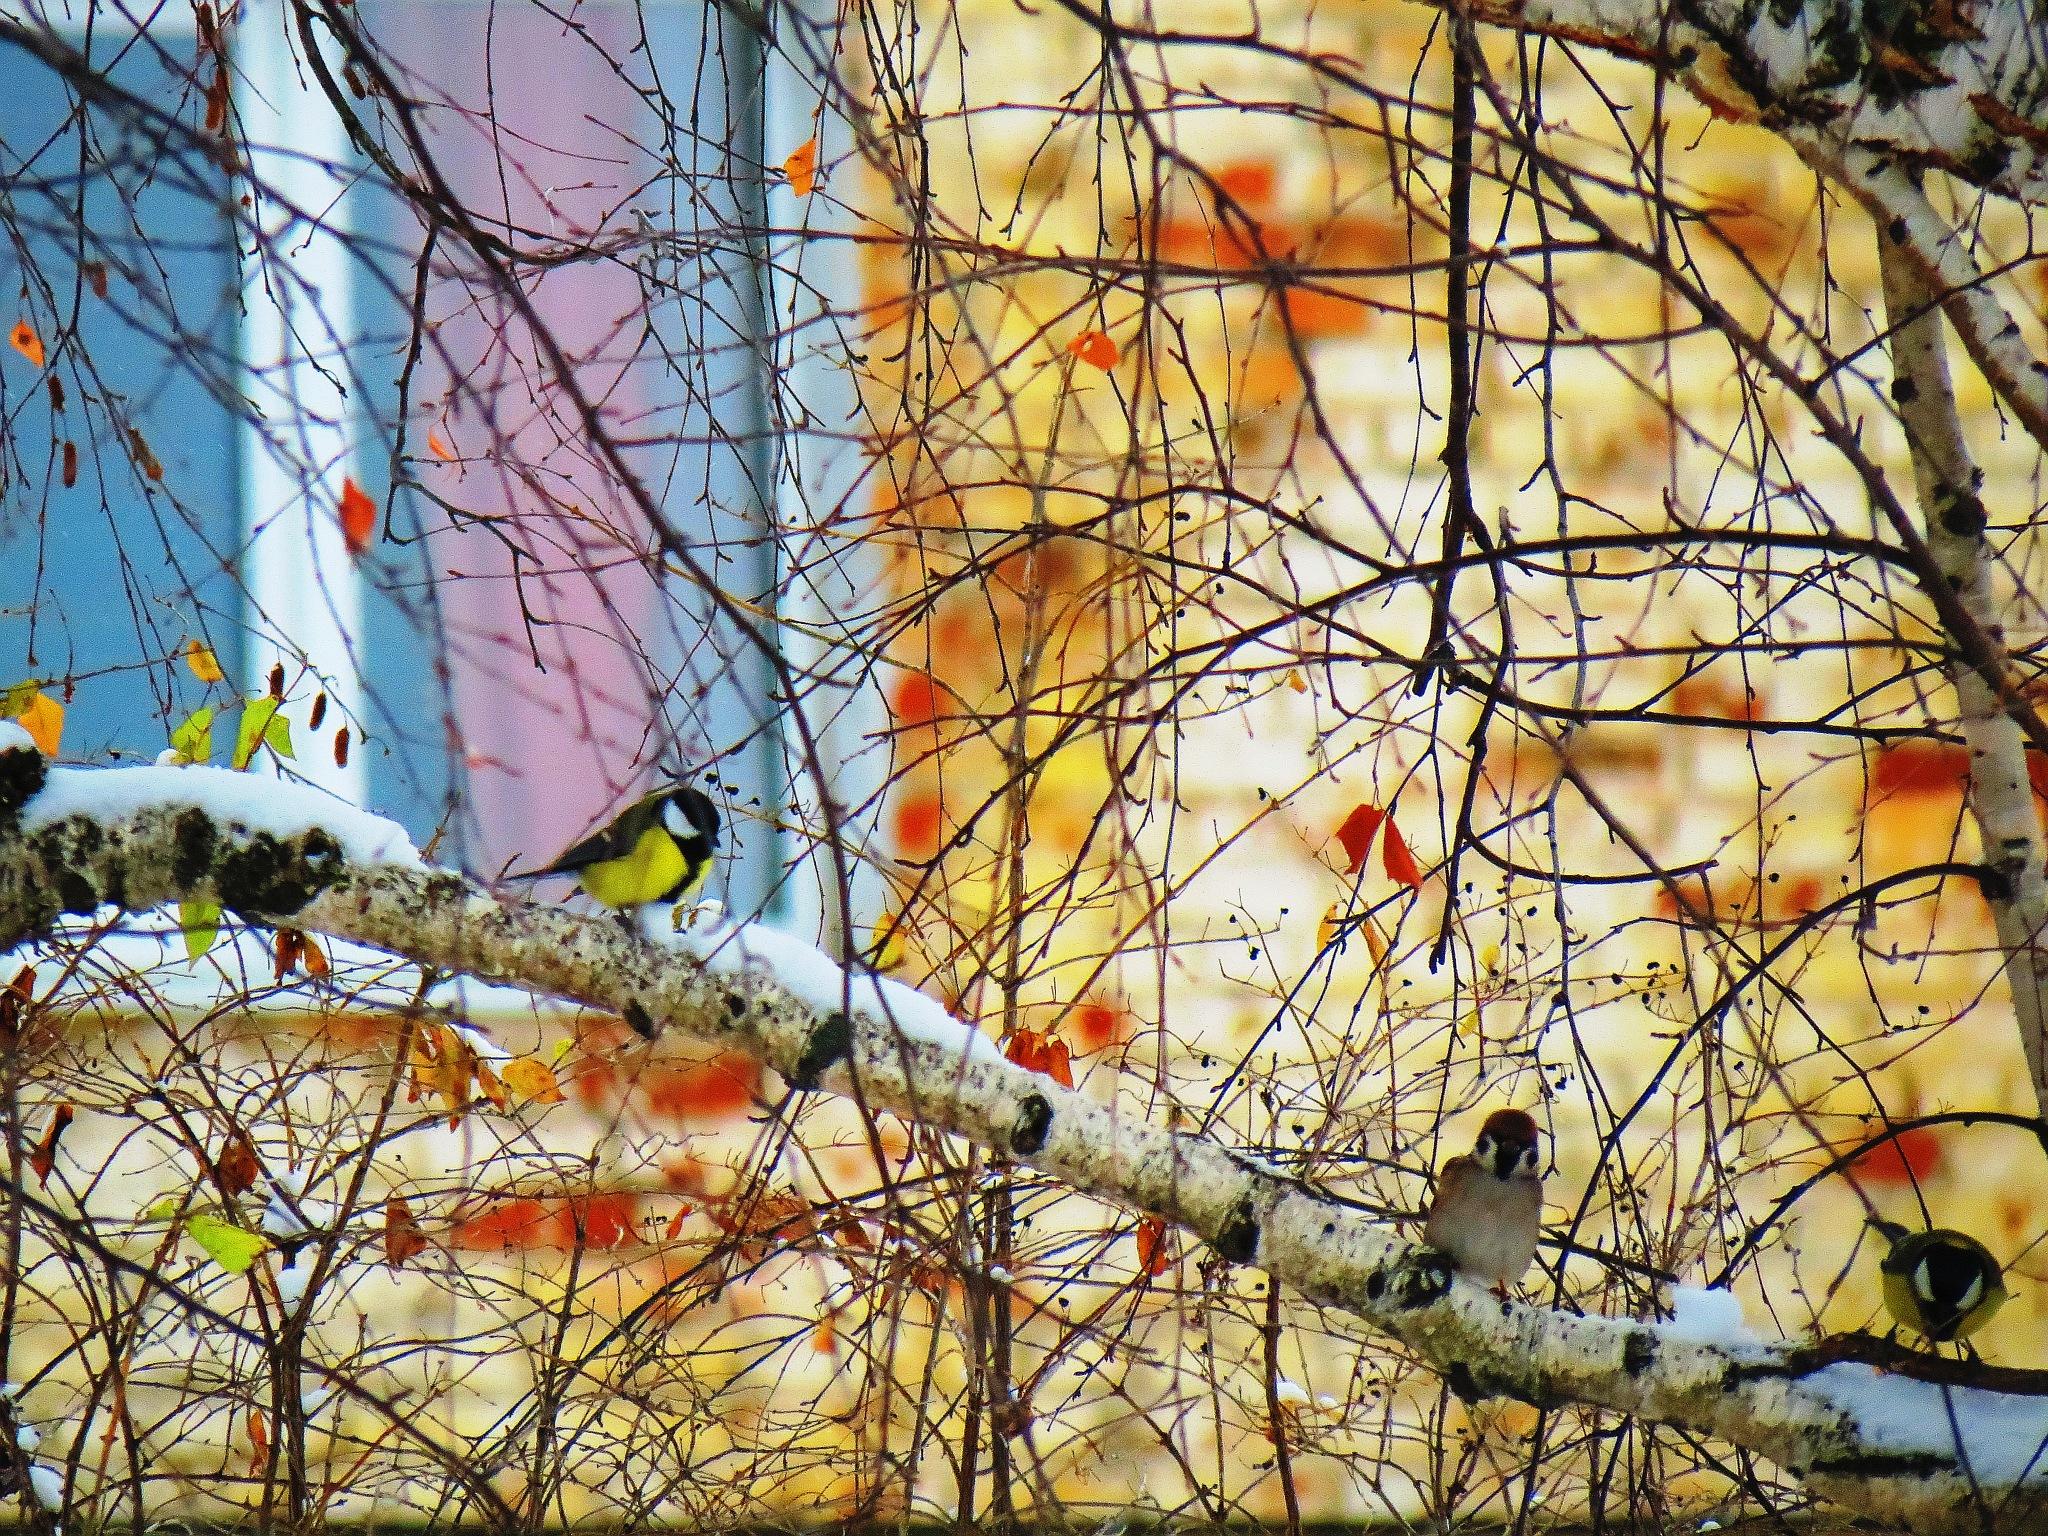 Birdies by sergey.parfeniuk